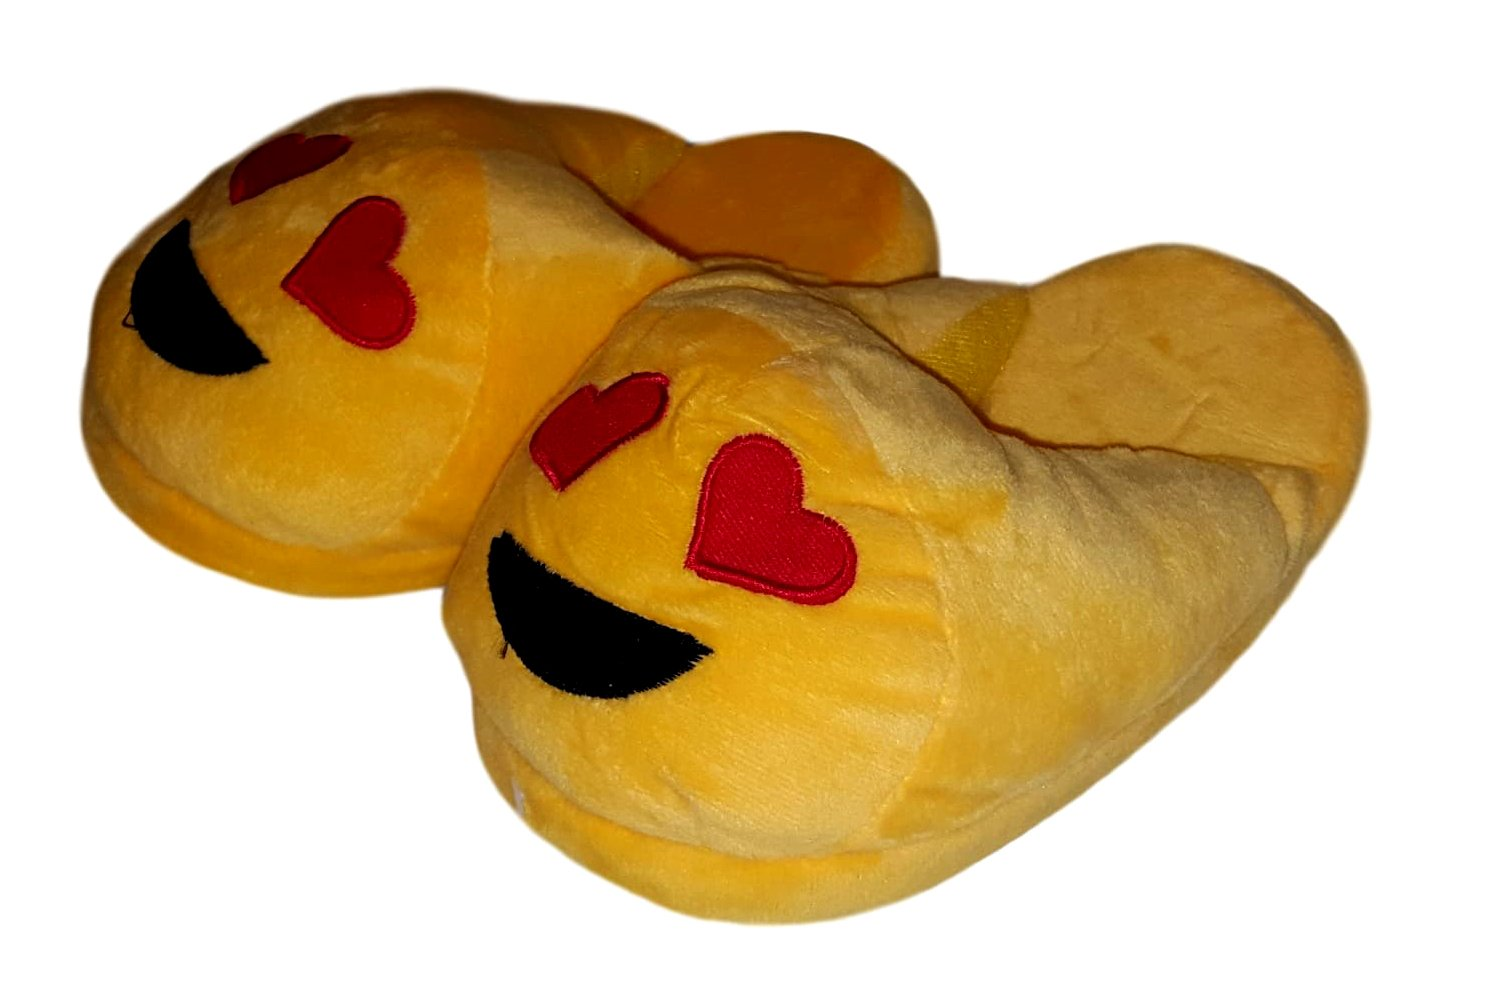 Adult Sized Emoji Plush Slipper (Medium (7-8), in Love)